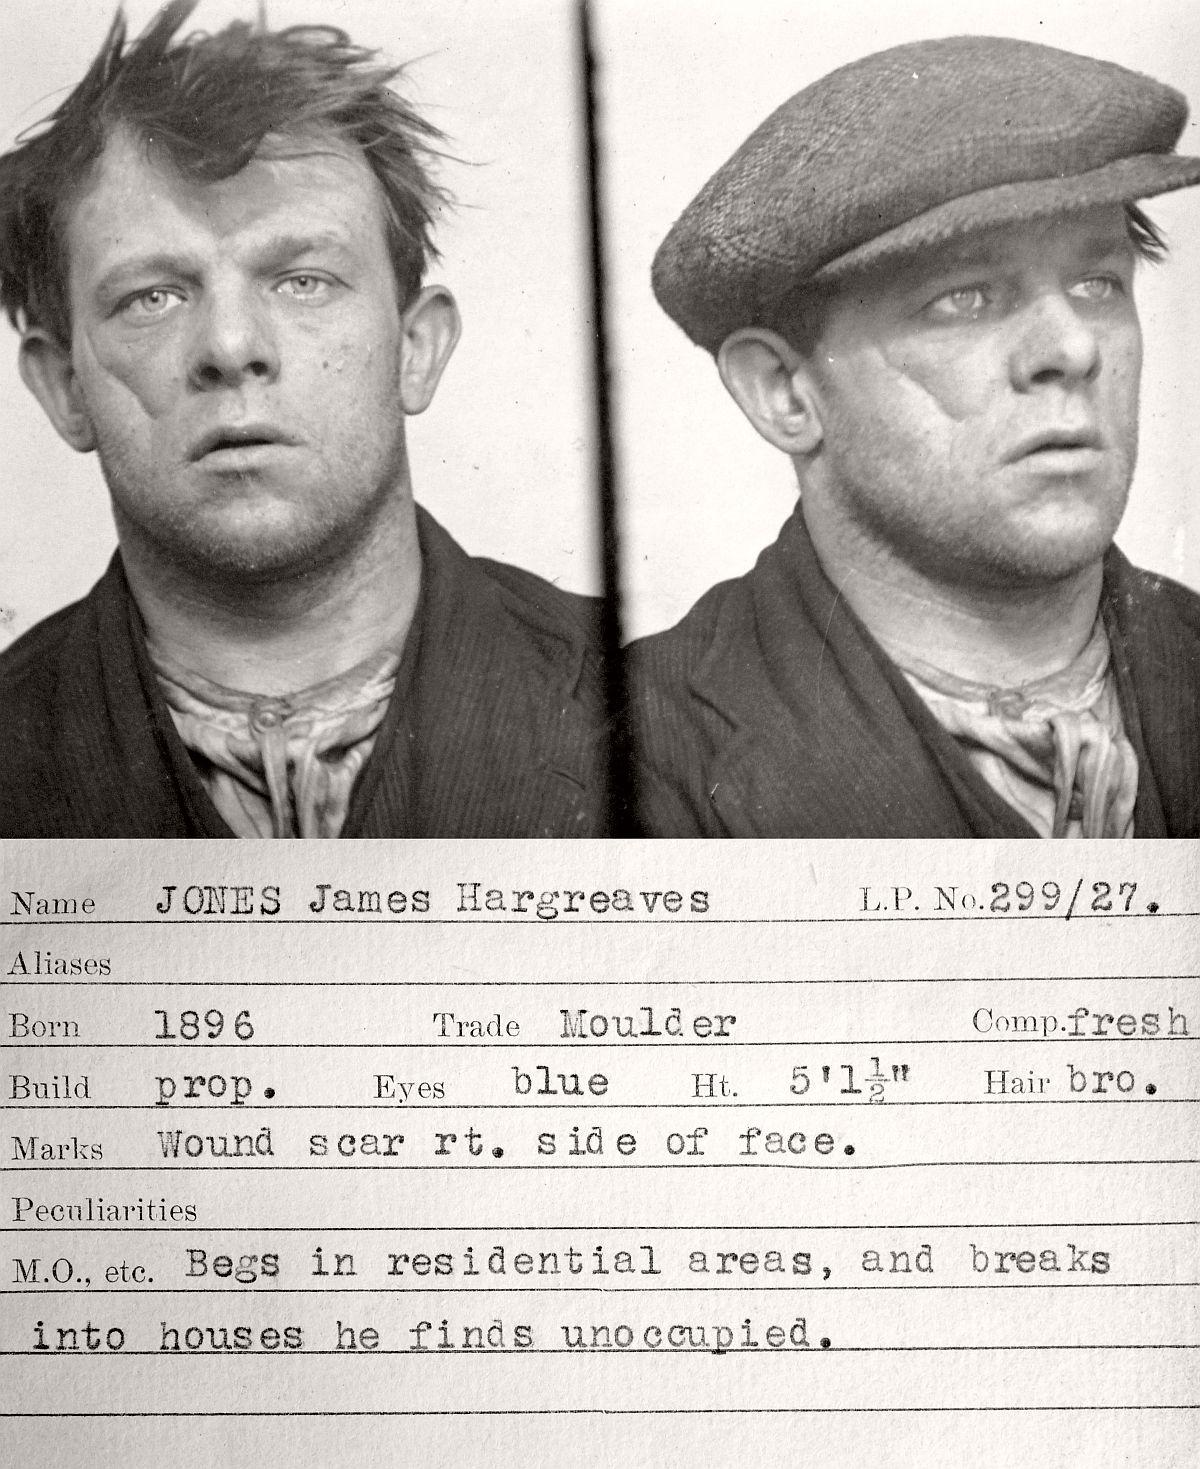 vintage-mug-shot-of-criminals-from-newcastle-upon-tyne-1930s-13